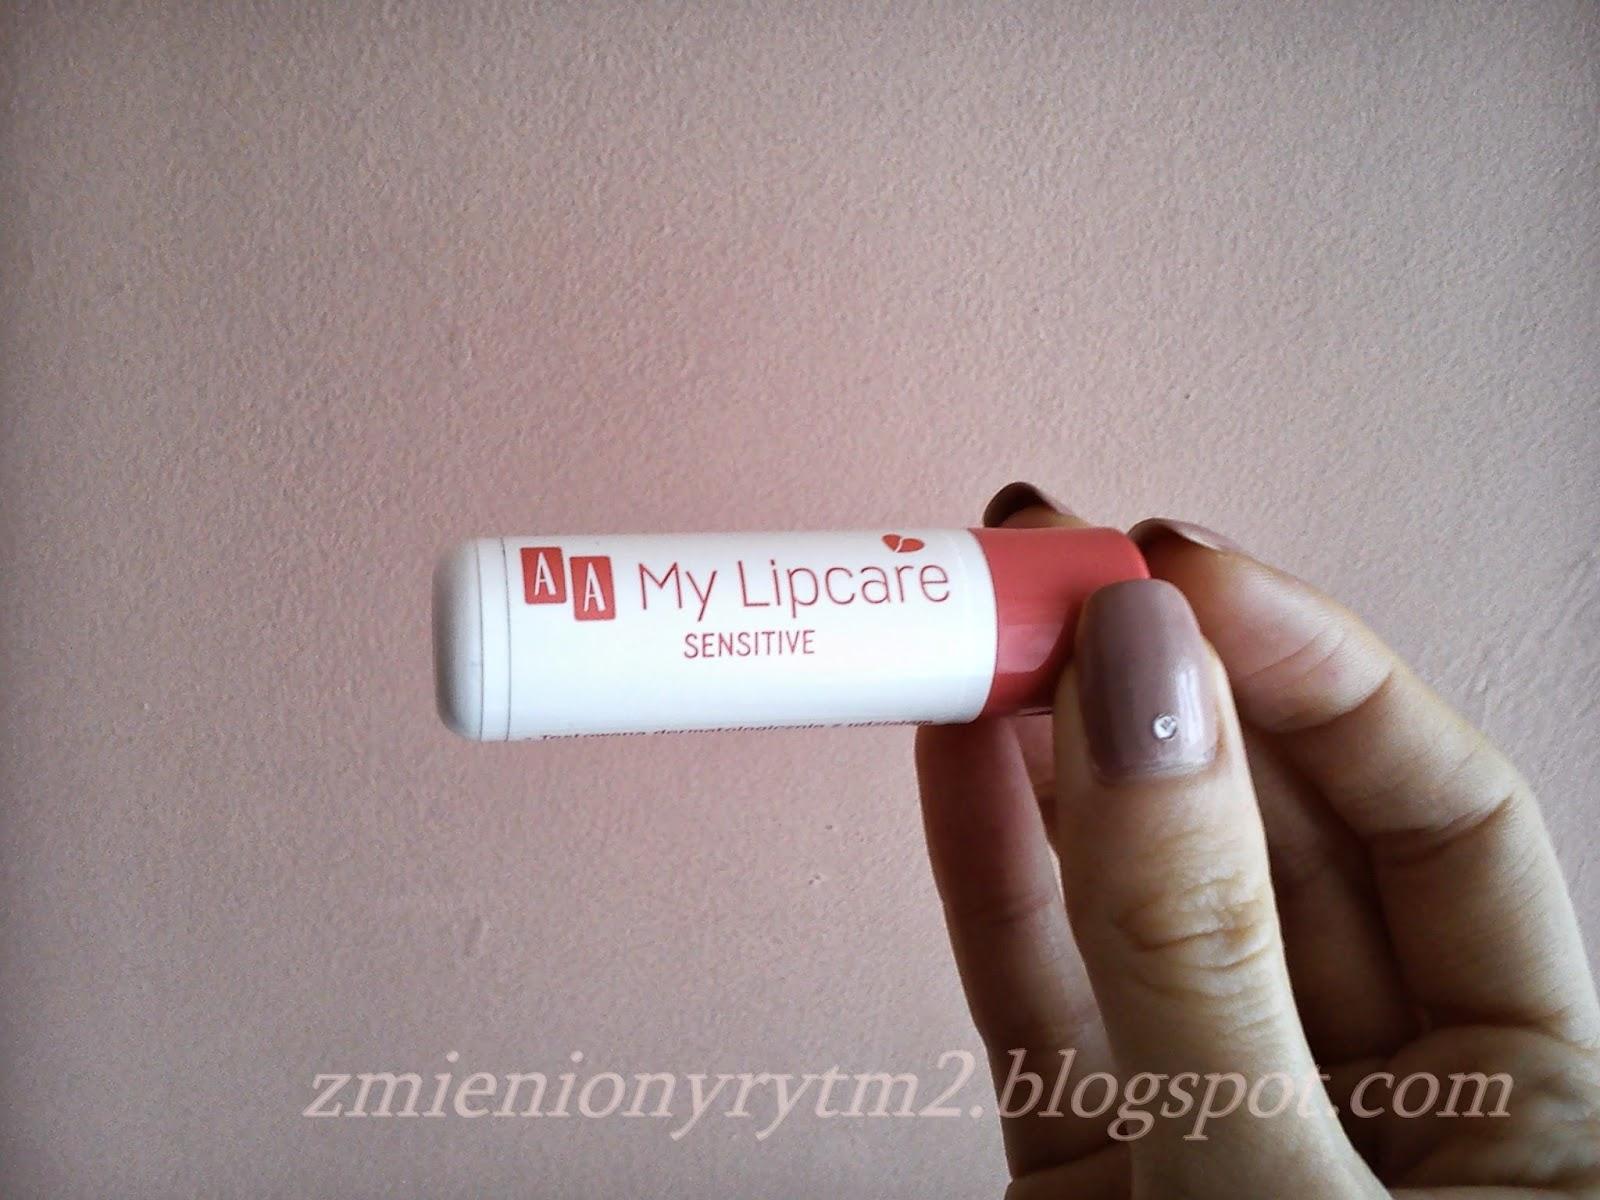 AA My Lipcare Sensitive